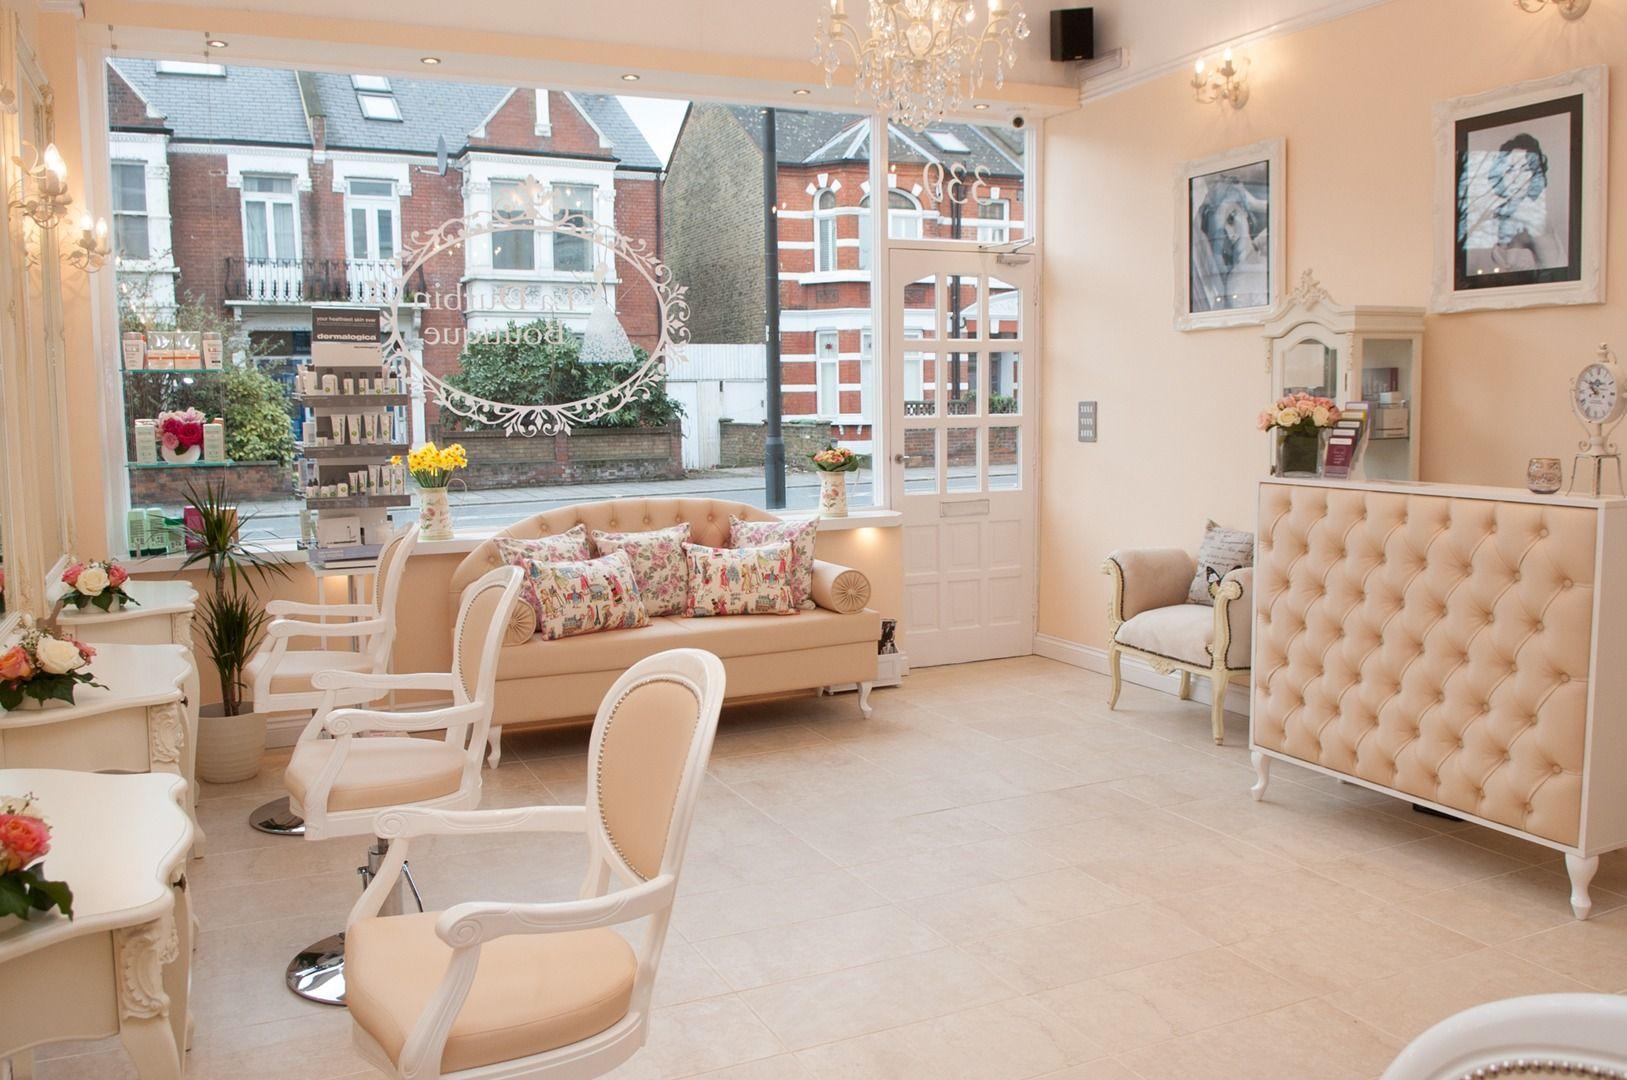 Incroyable Hair, Beauty   La Durbin Boutique Salon   London Sw6, Uk